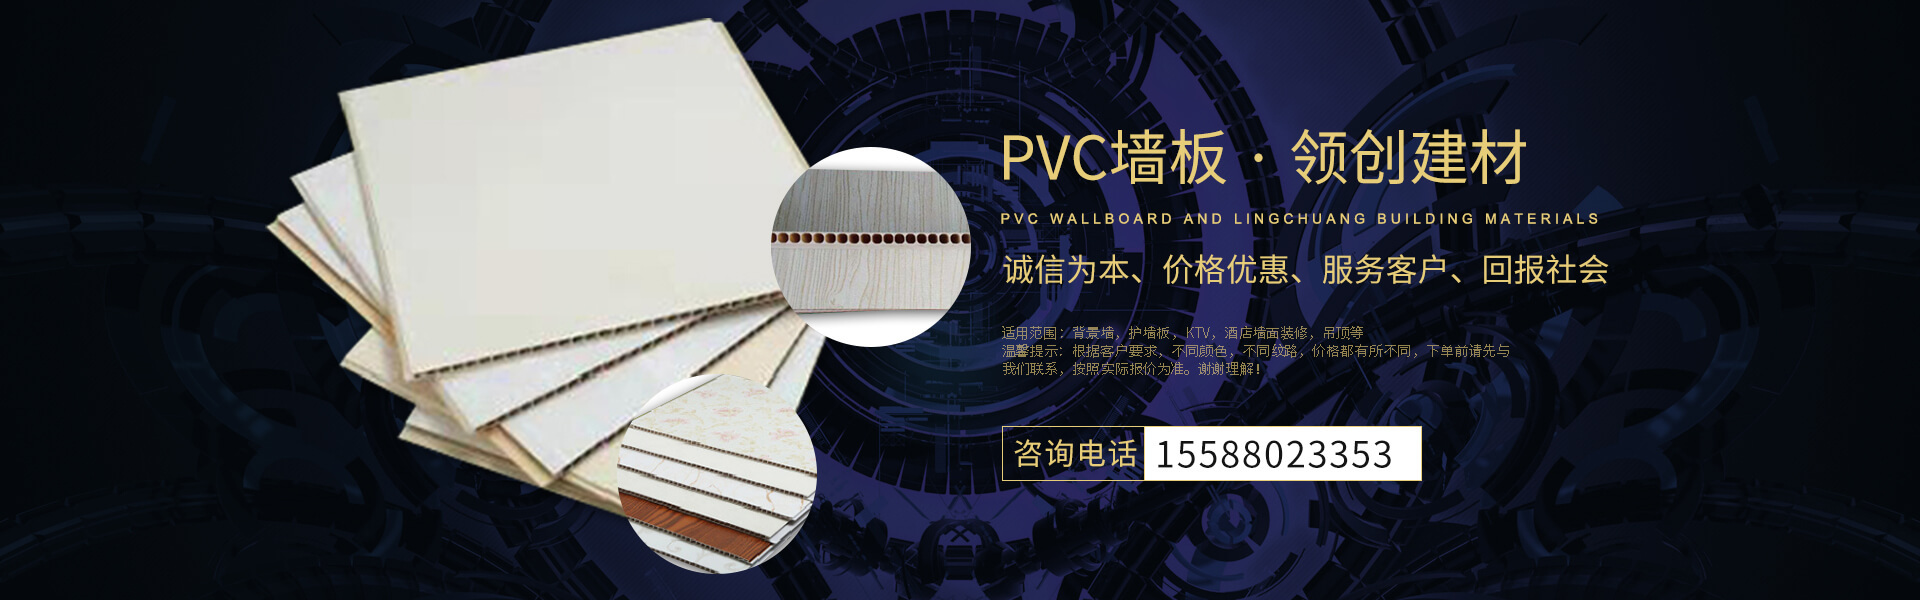 pvc扣板生产厂家,专业pvc墙板厂家,pvc扣板厂家,山东pvc墙板厂家